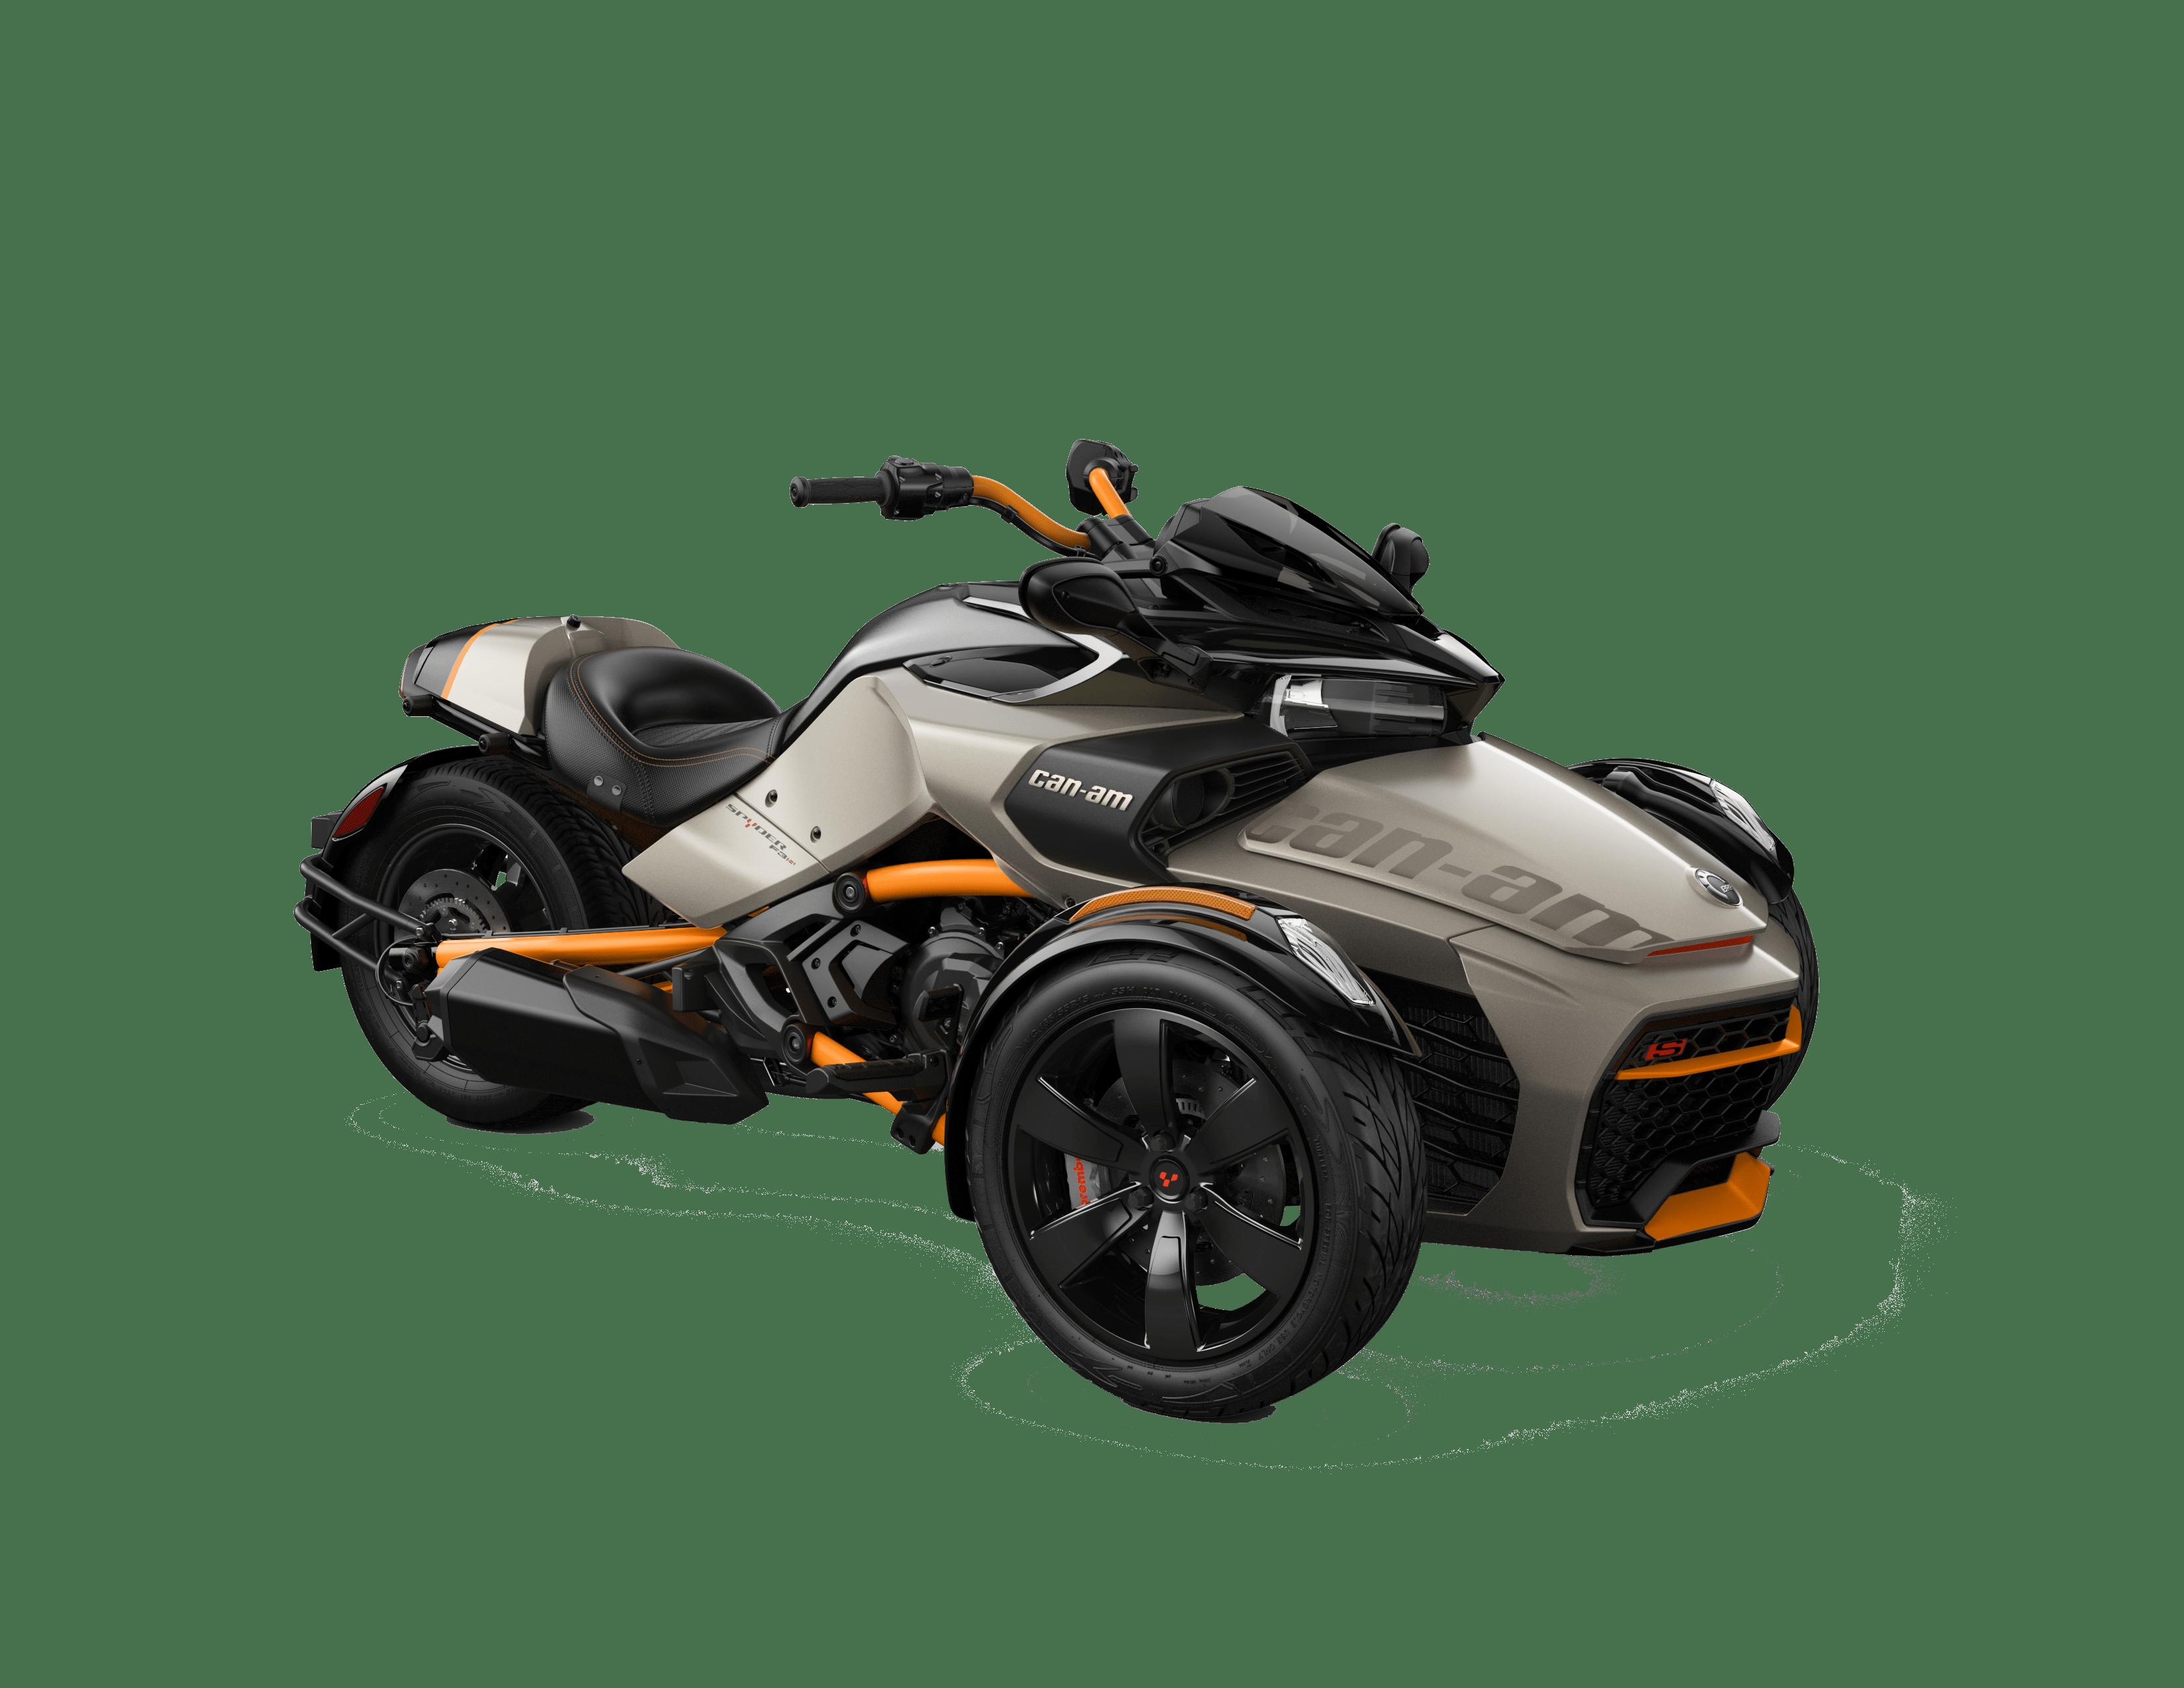 SPYDER F3-S product image 1